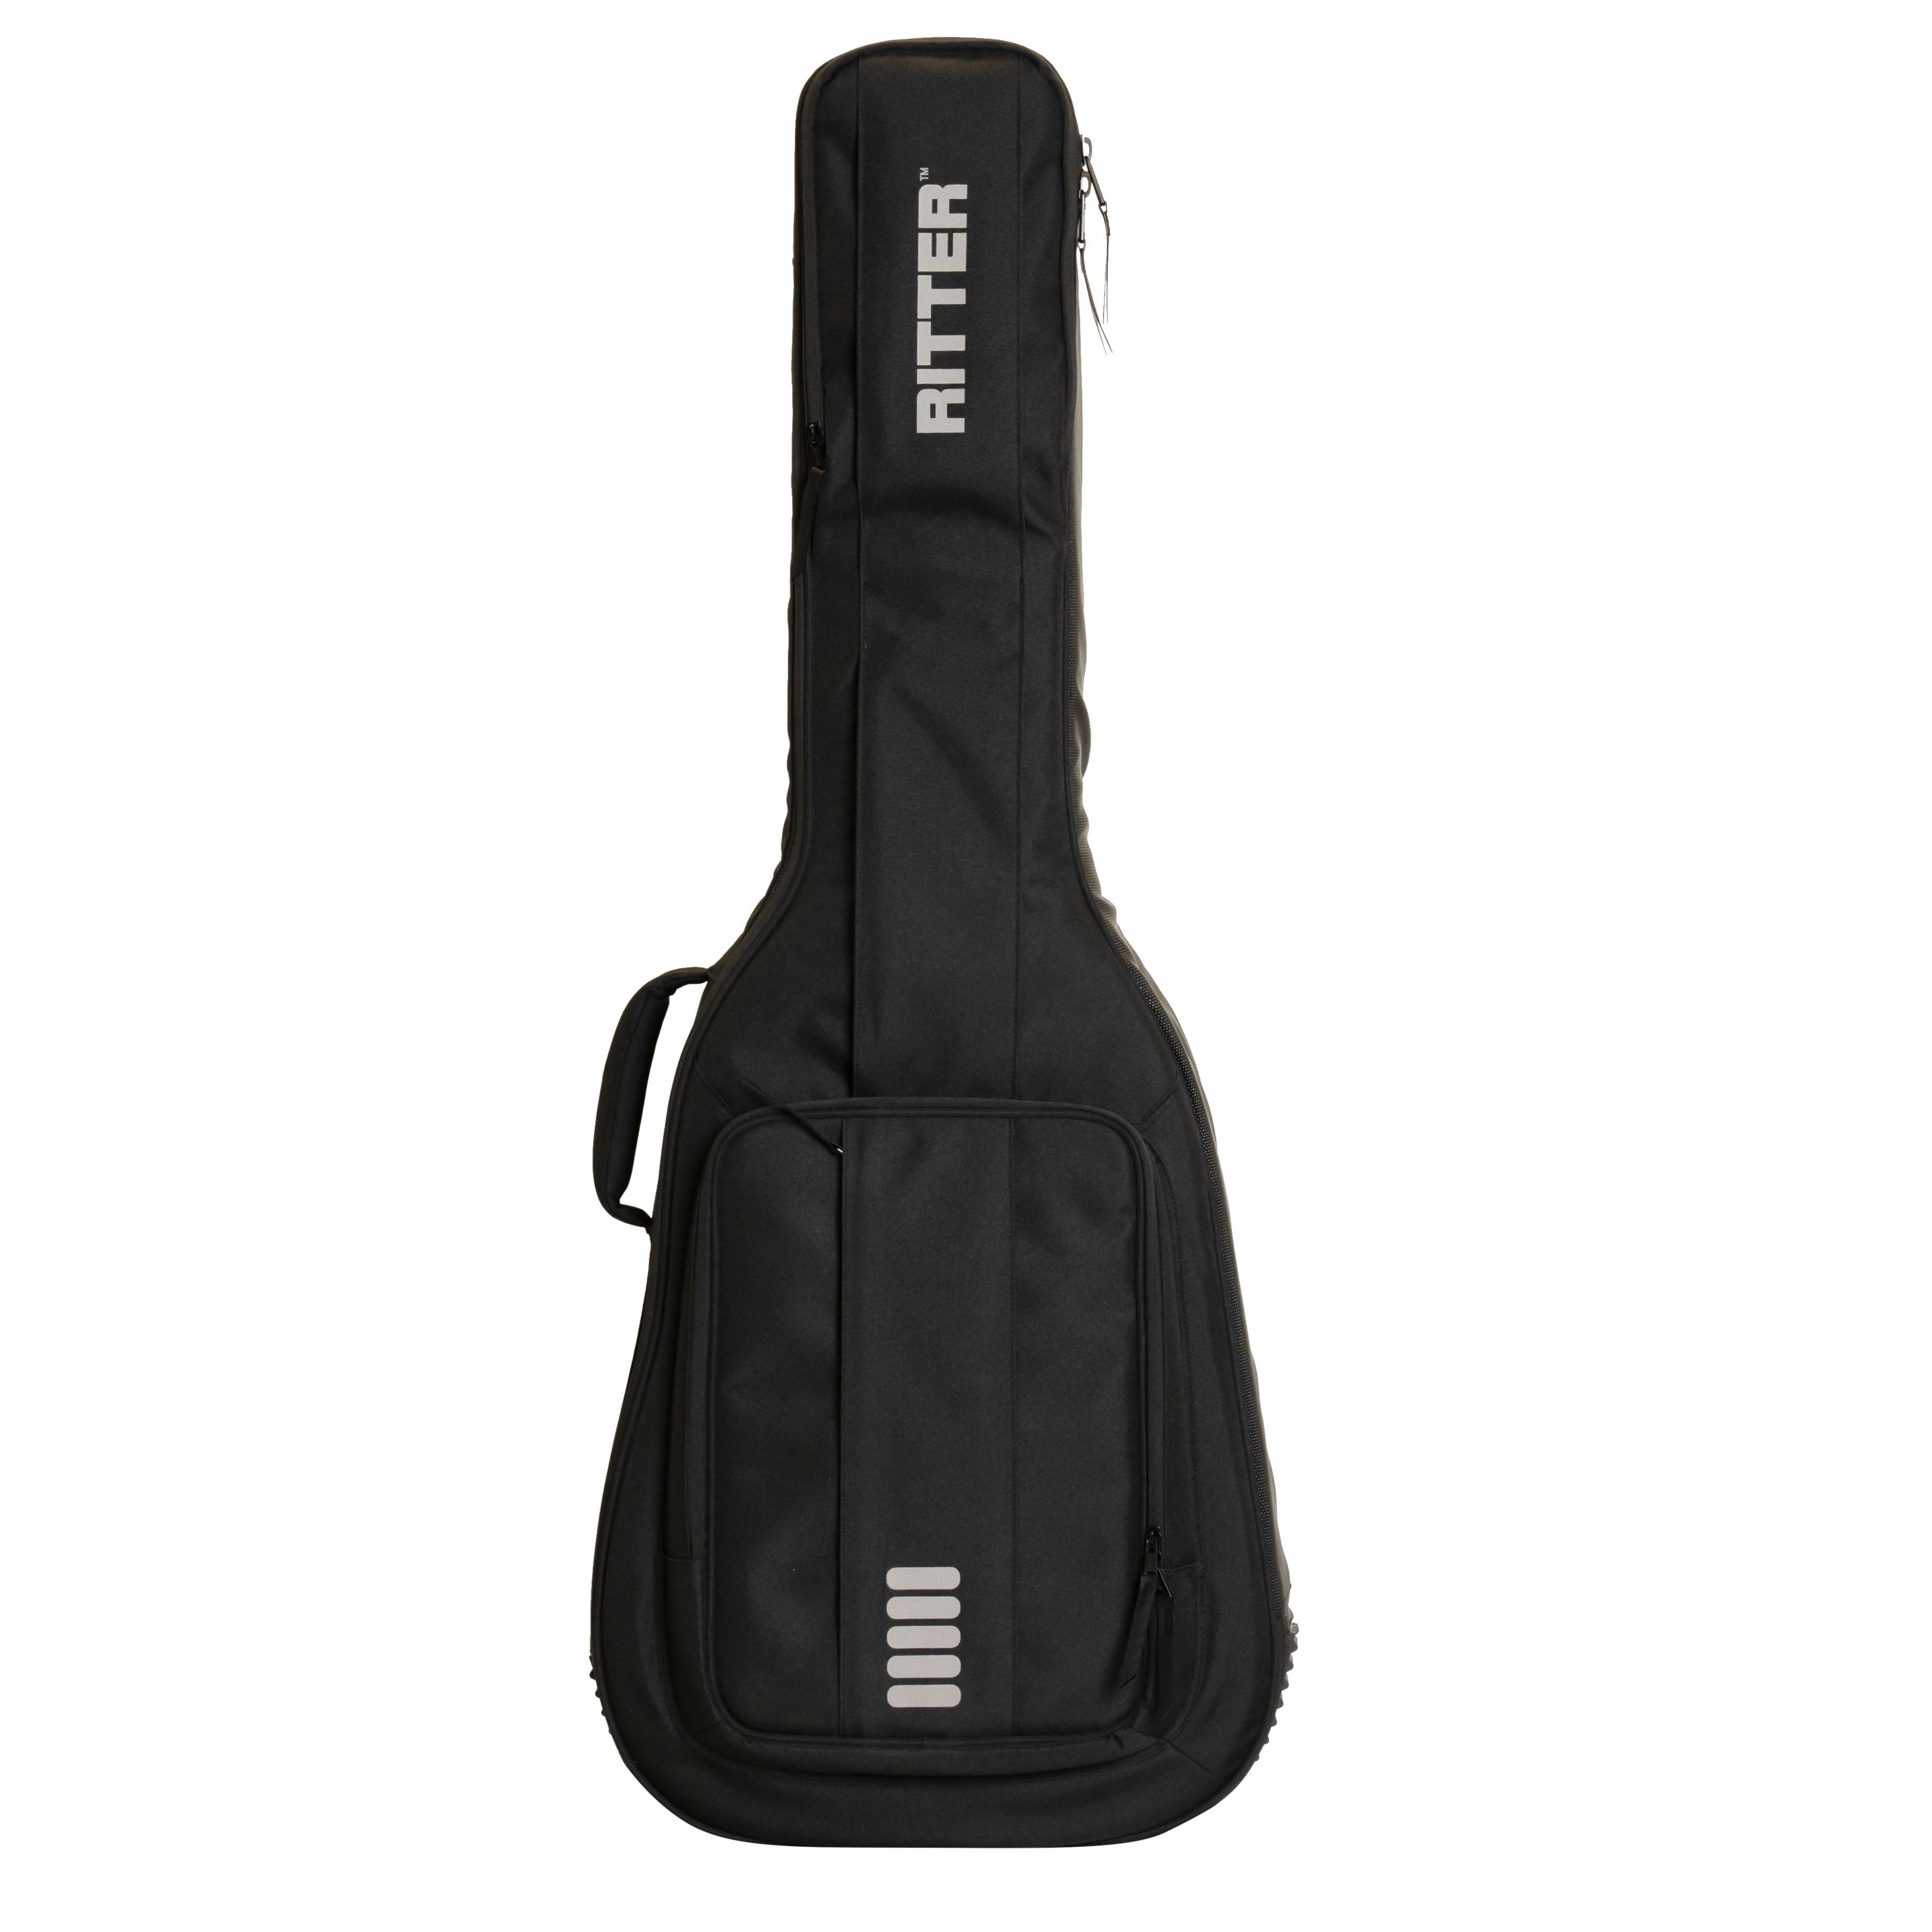 Ritter Arosa Folk Acoustic Guitar Bag - Sea Ground Black (RGA5-F)